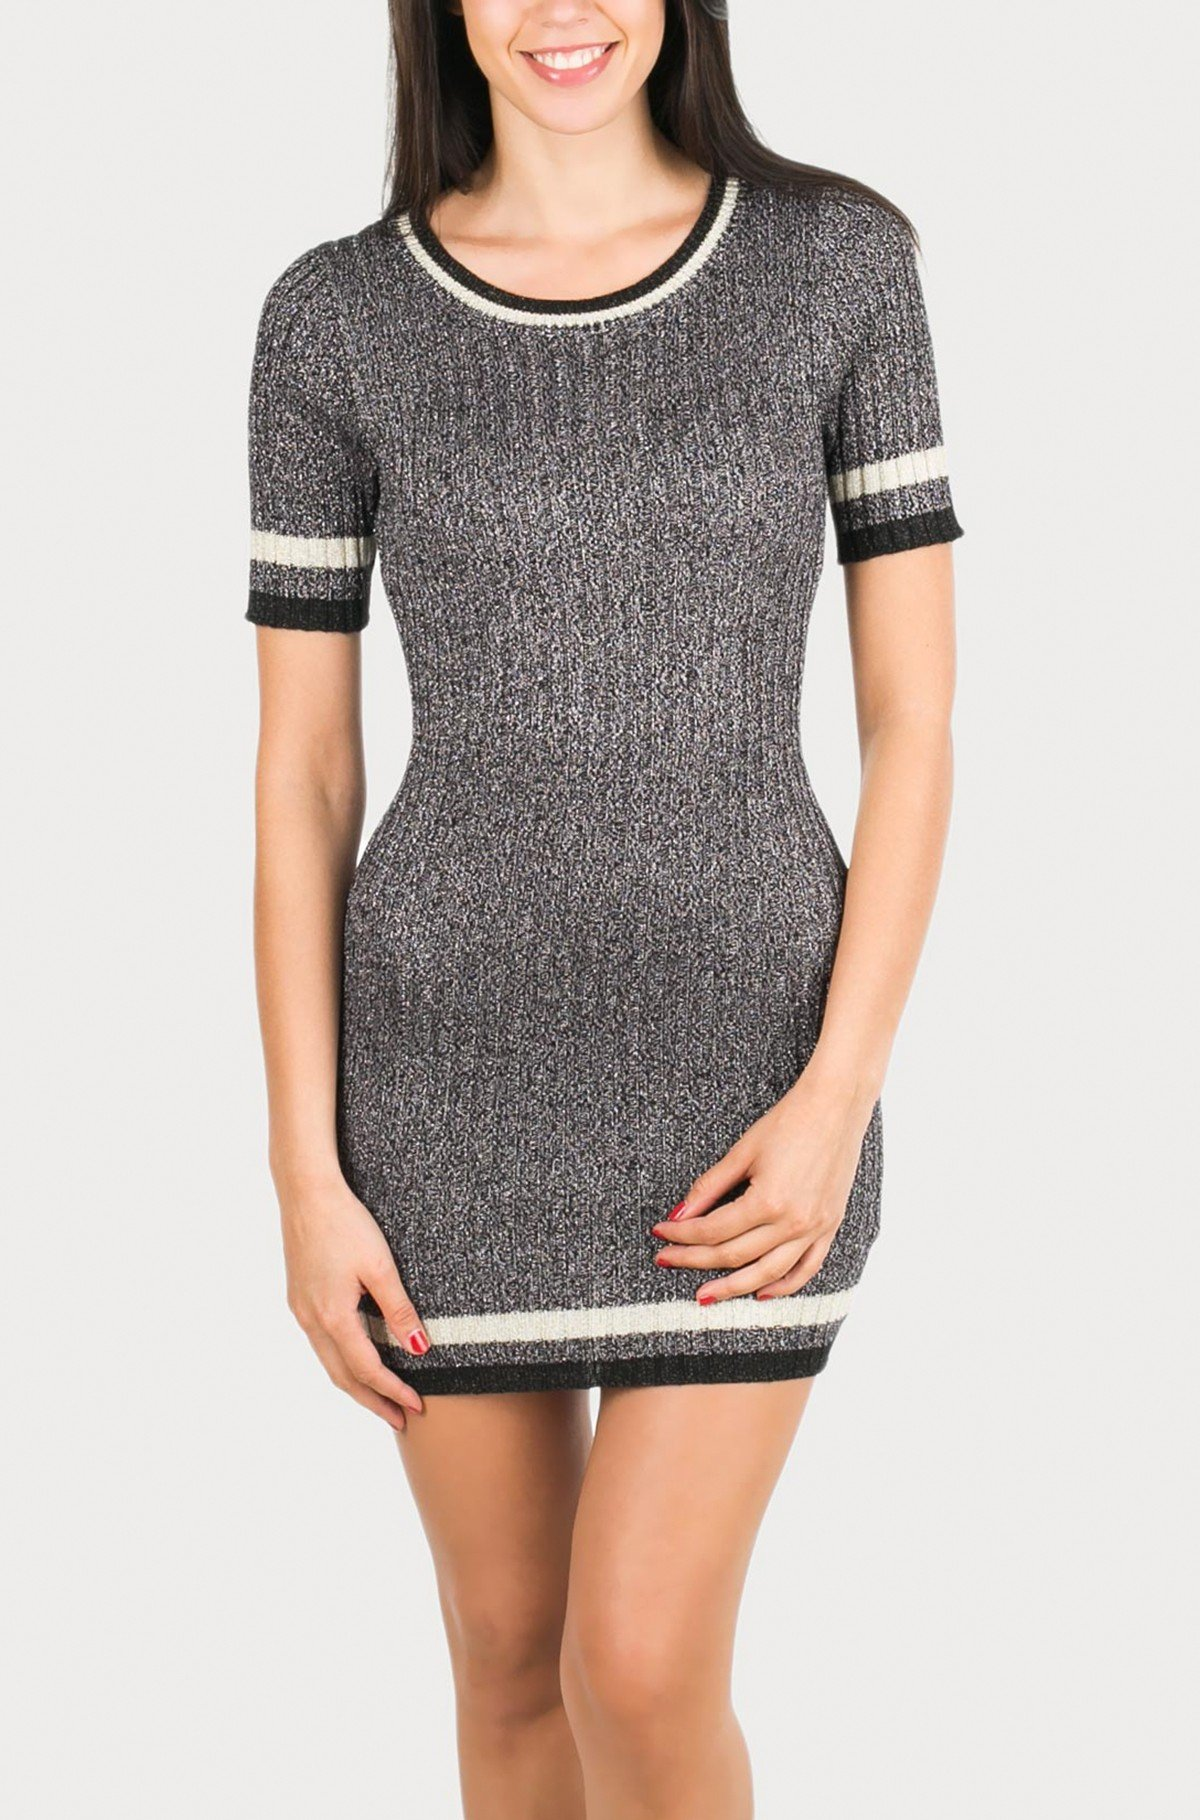 Kootud kleit 5327-full-1